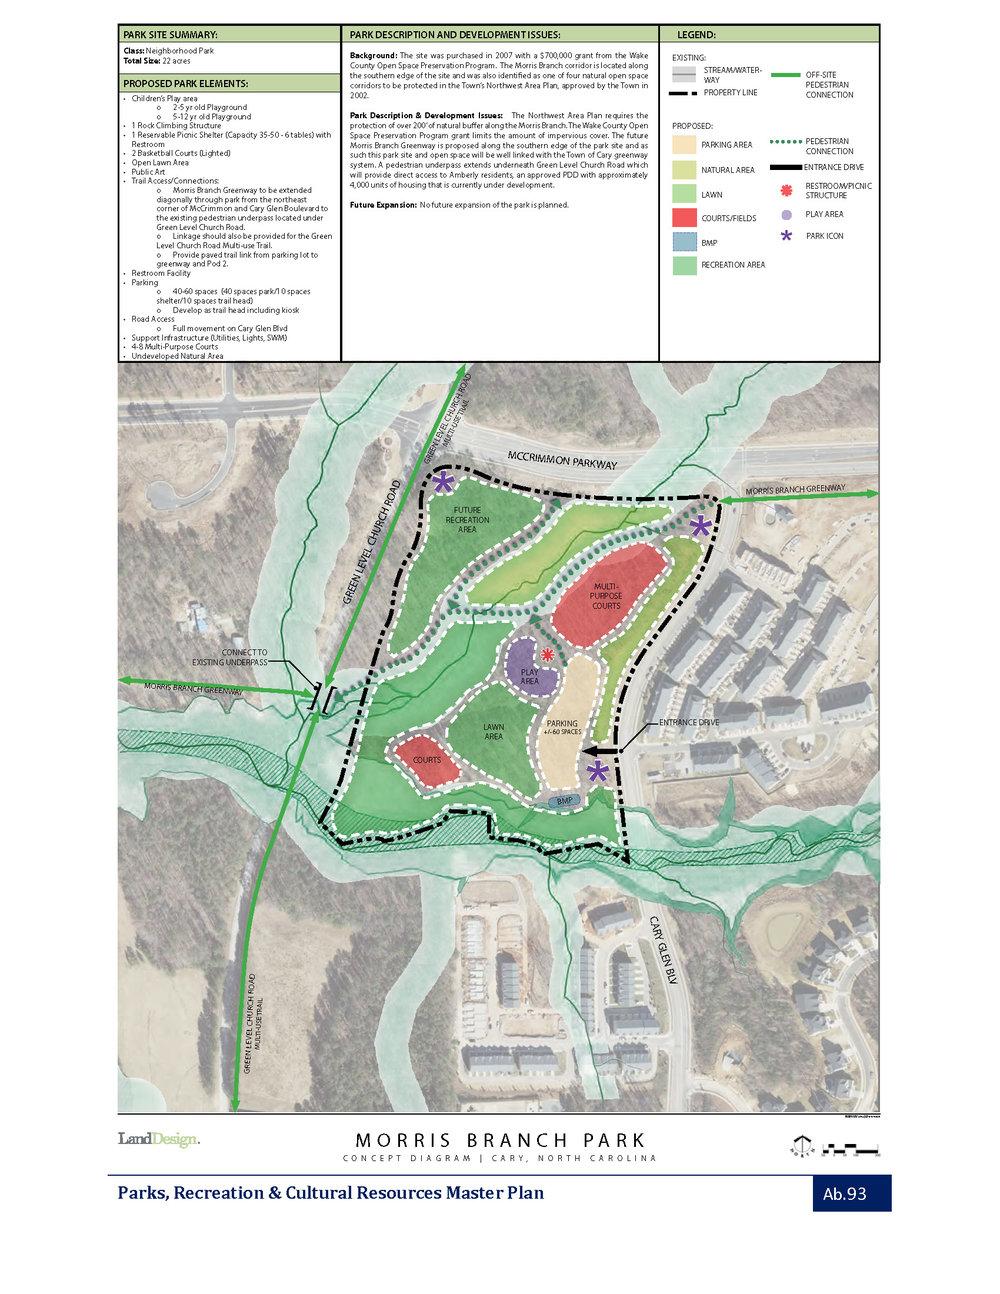 Morris Branch Concept Plan - 2012.jpg